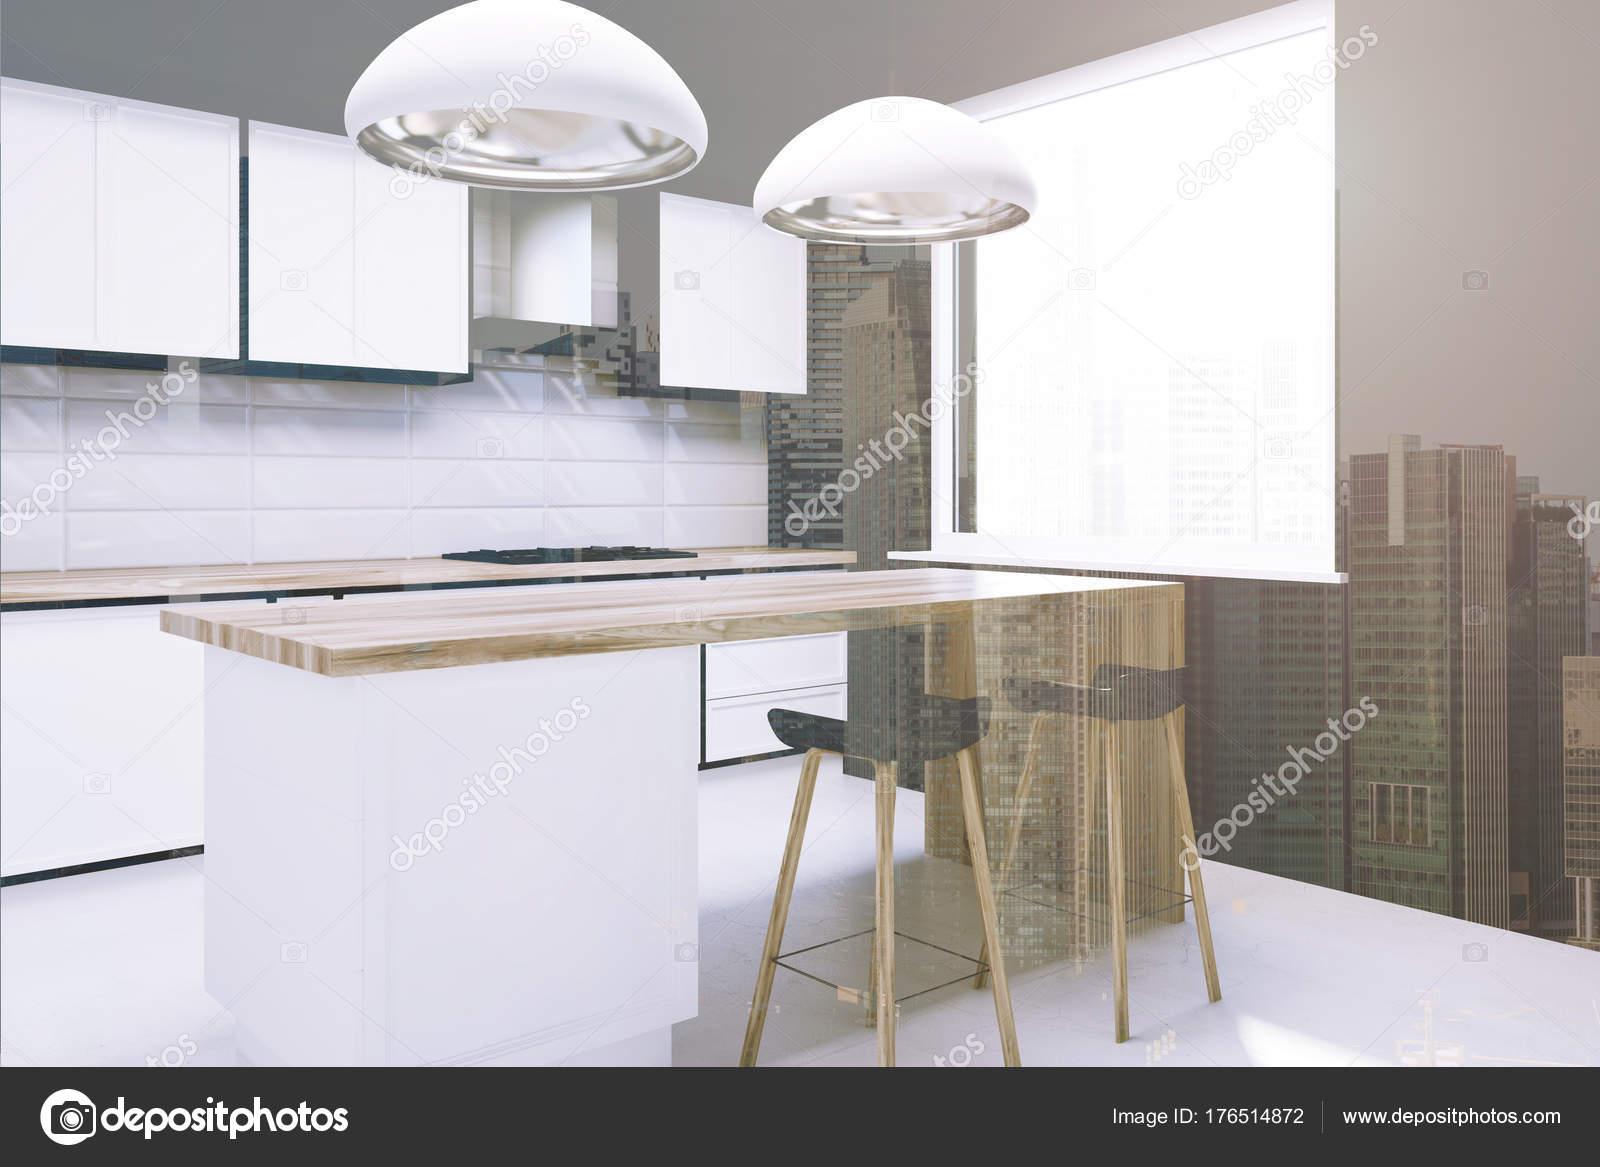 Witte Tegels Keuken : Witte tegel keuken met bar kant toned u stockfoto